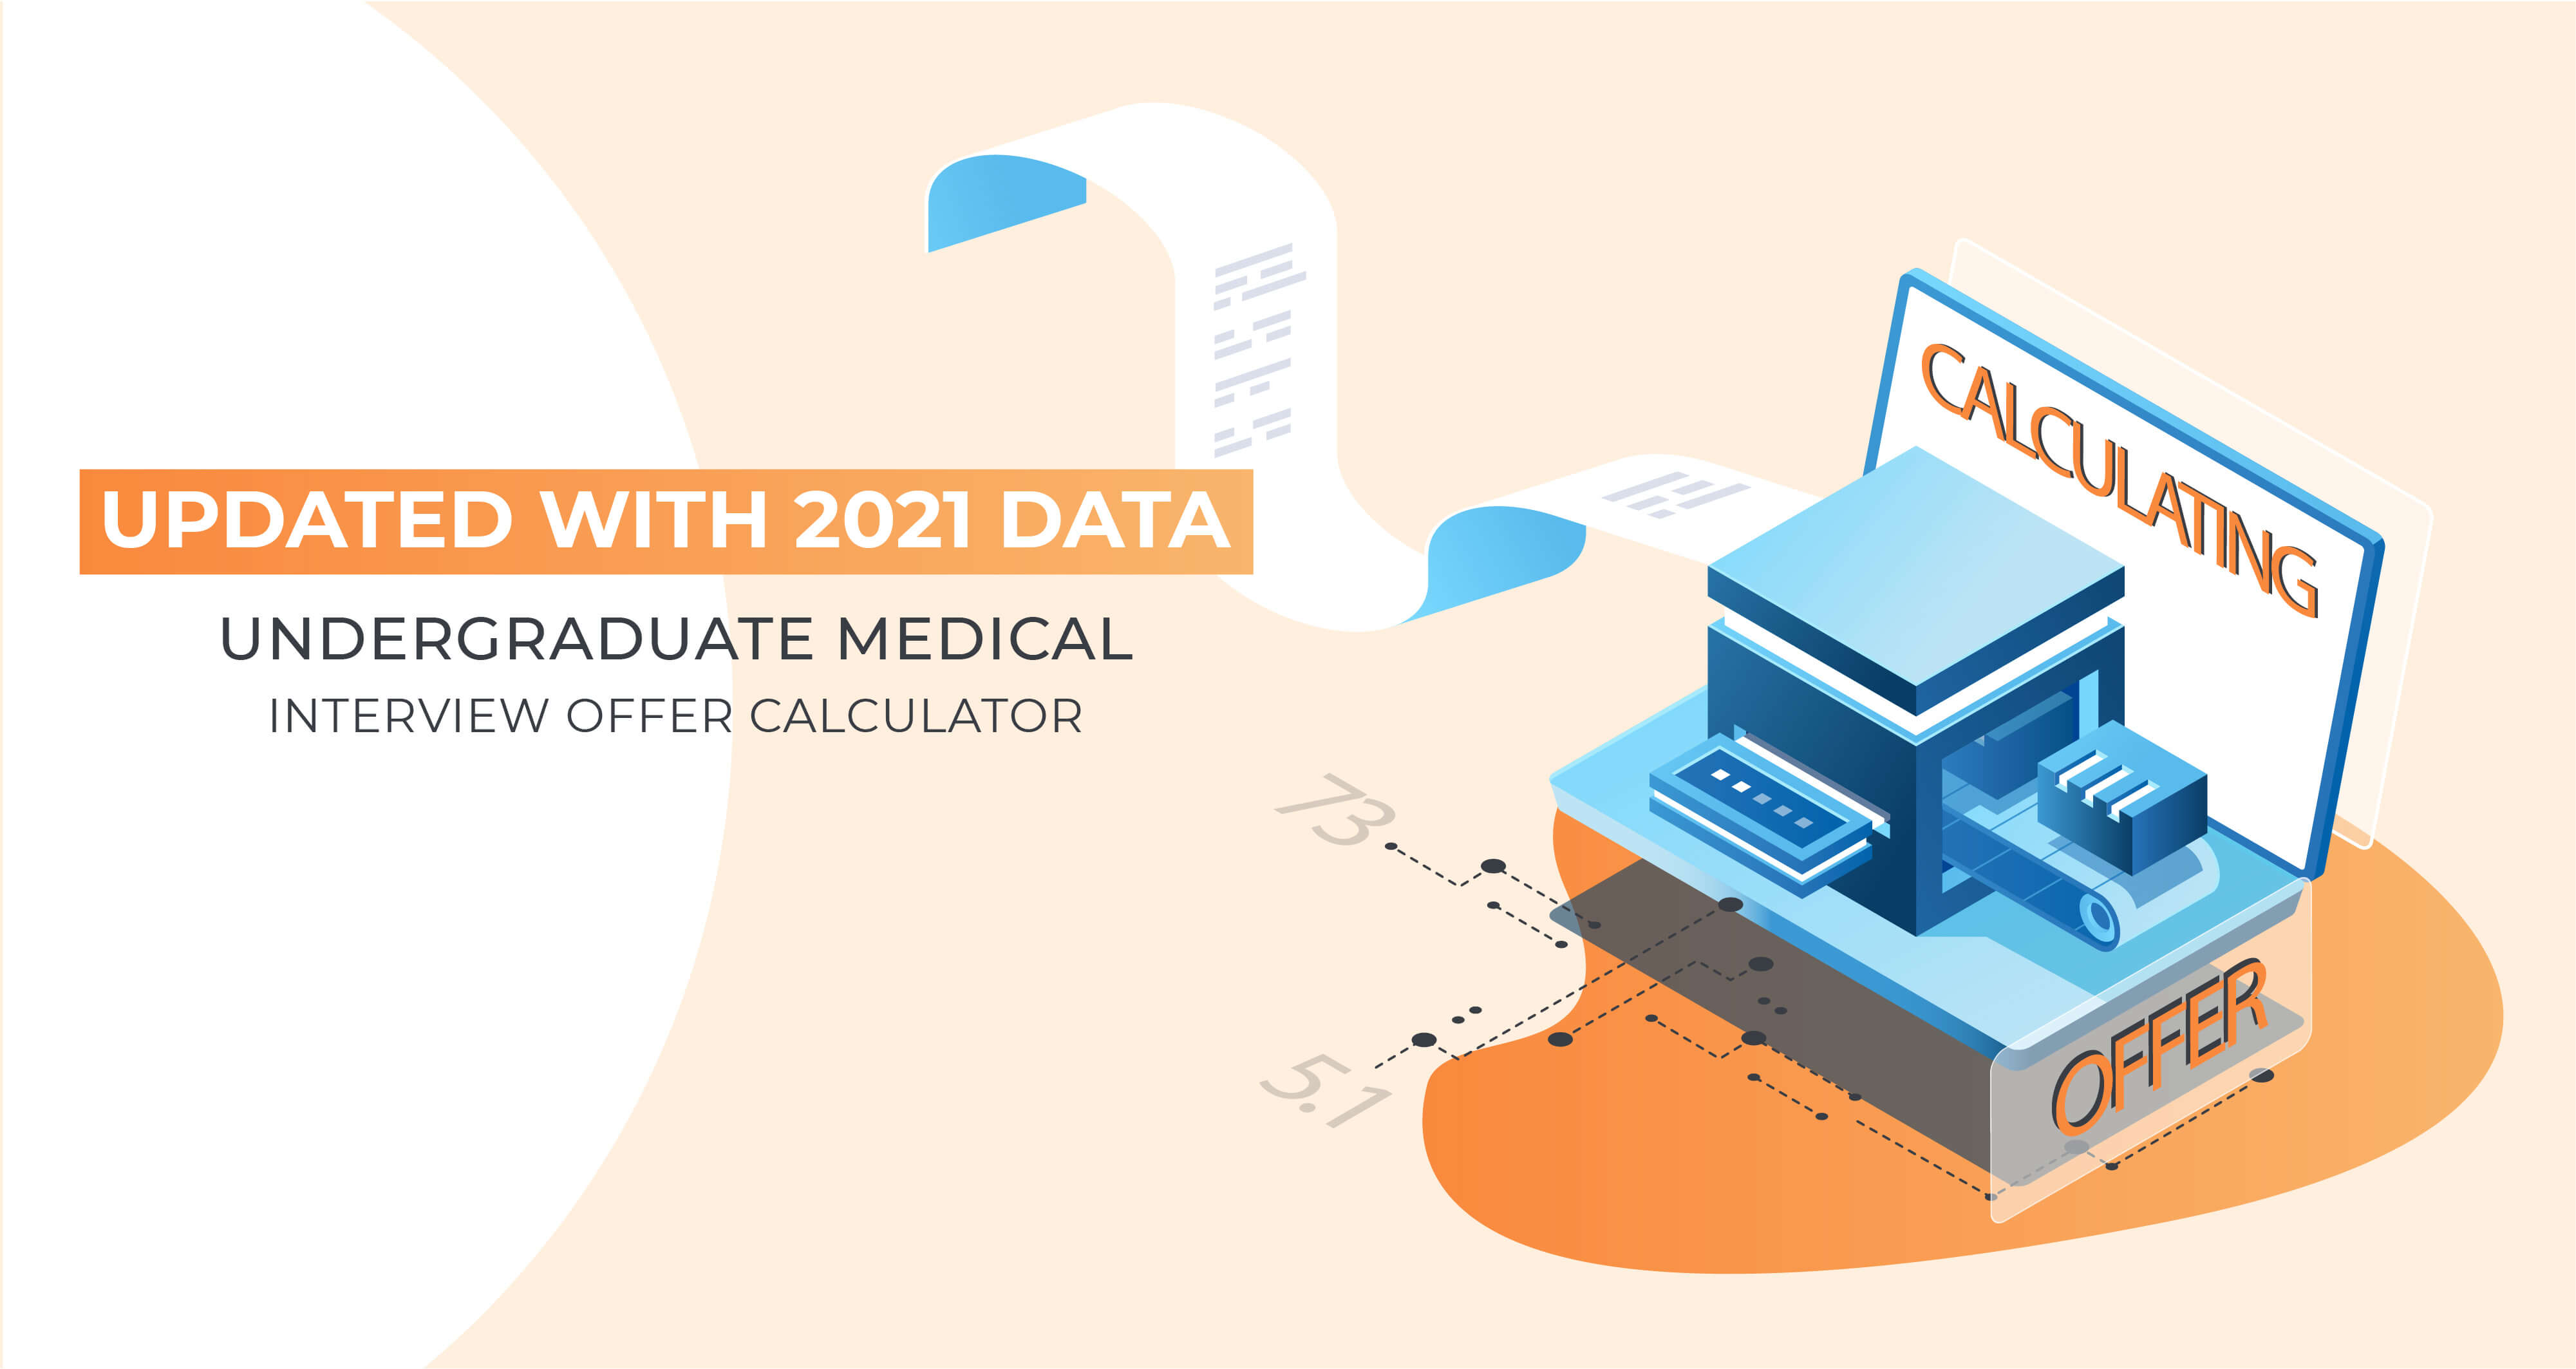 UCAT Medical Interview Offer Calculator